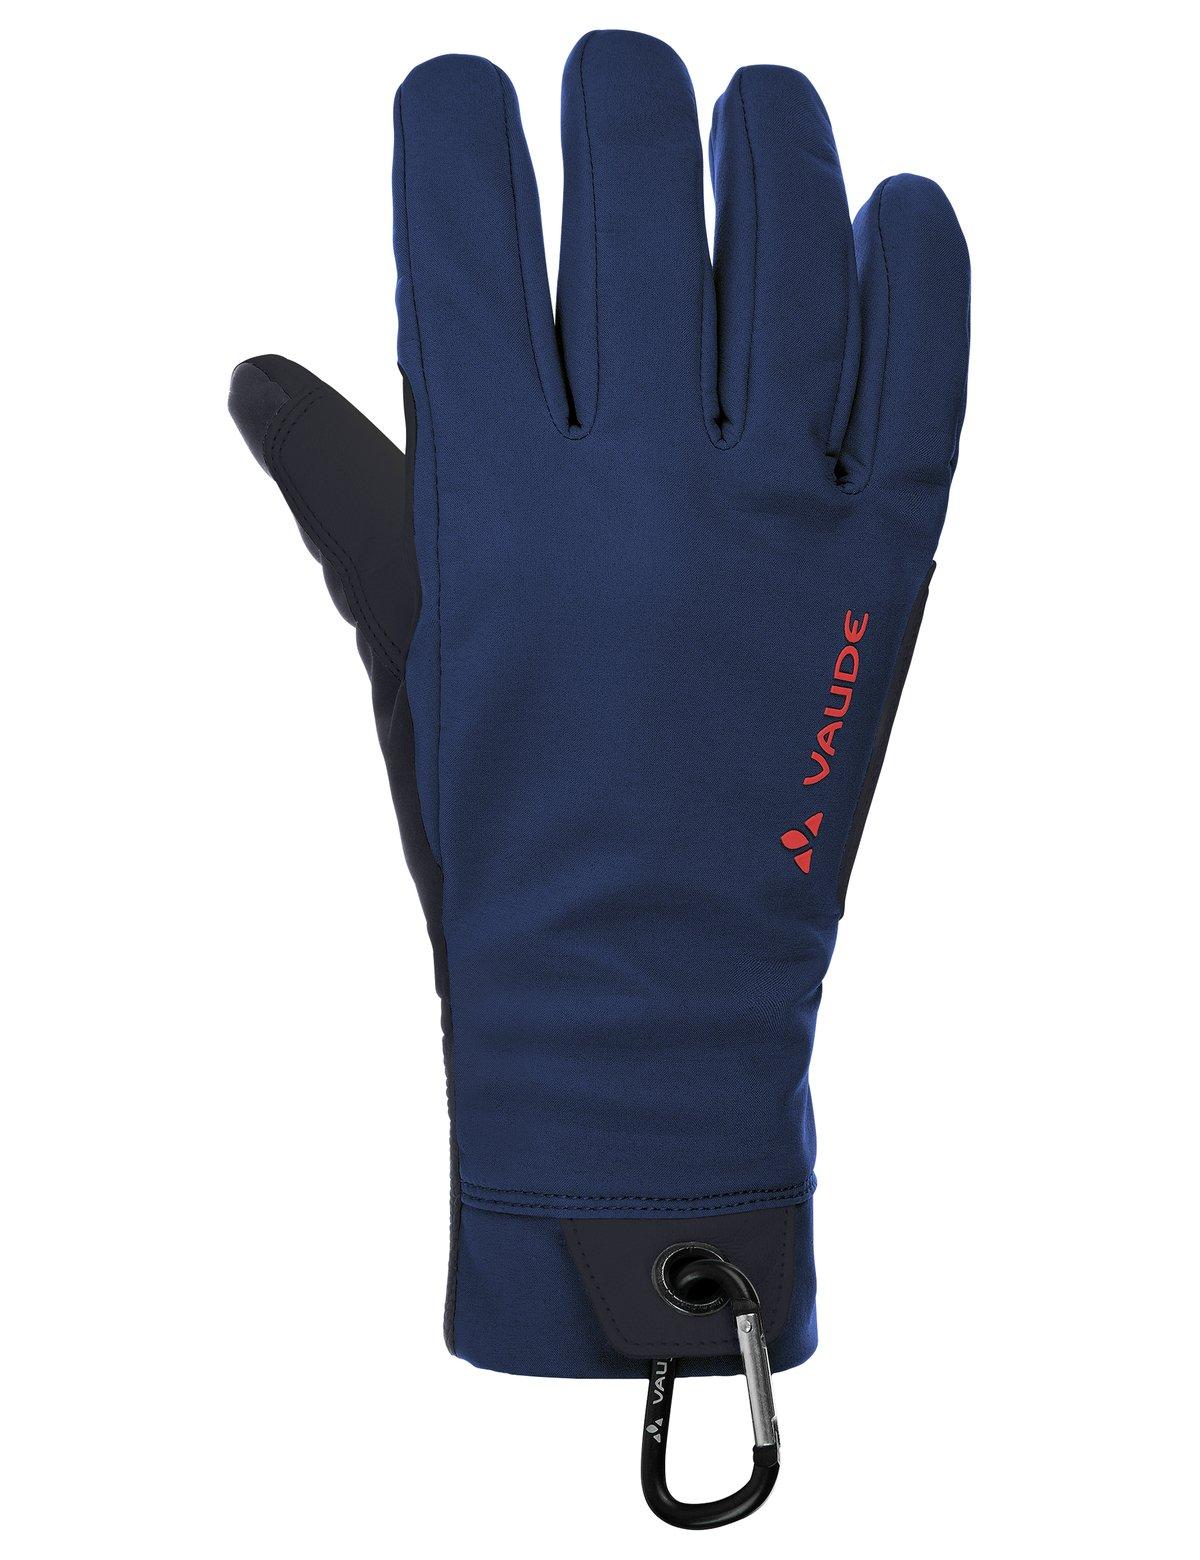 71dIlpIkF7L - VAUDE Men's Lagalp Softshell Gloves